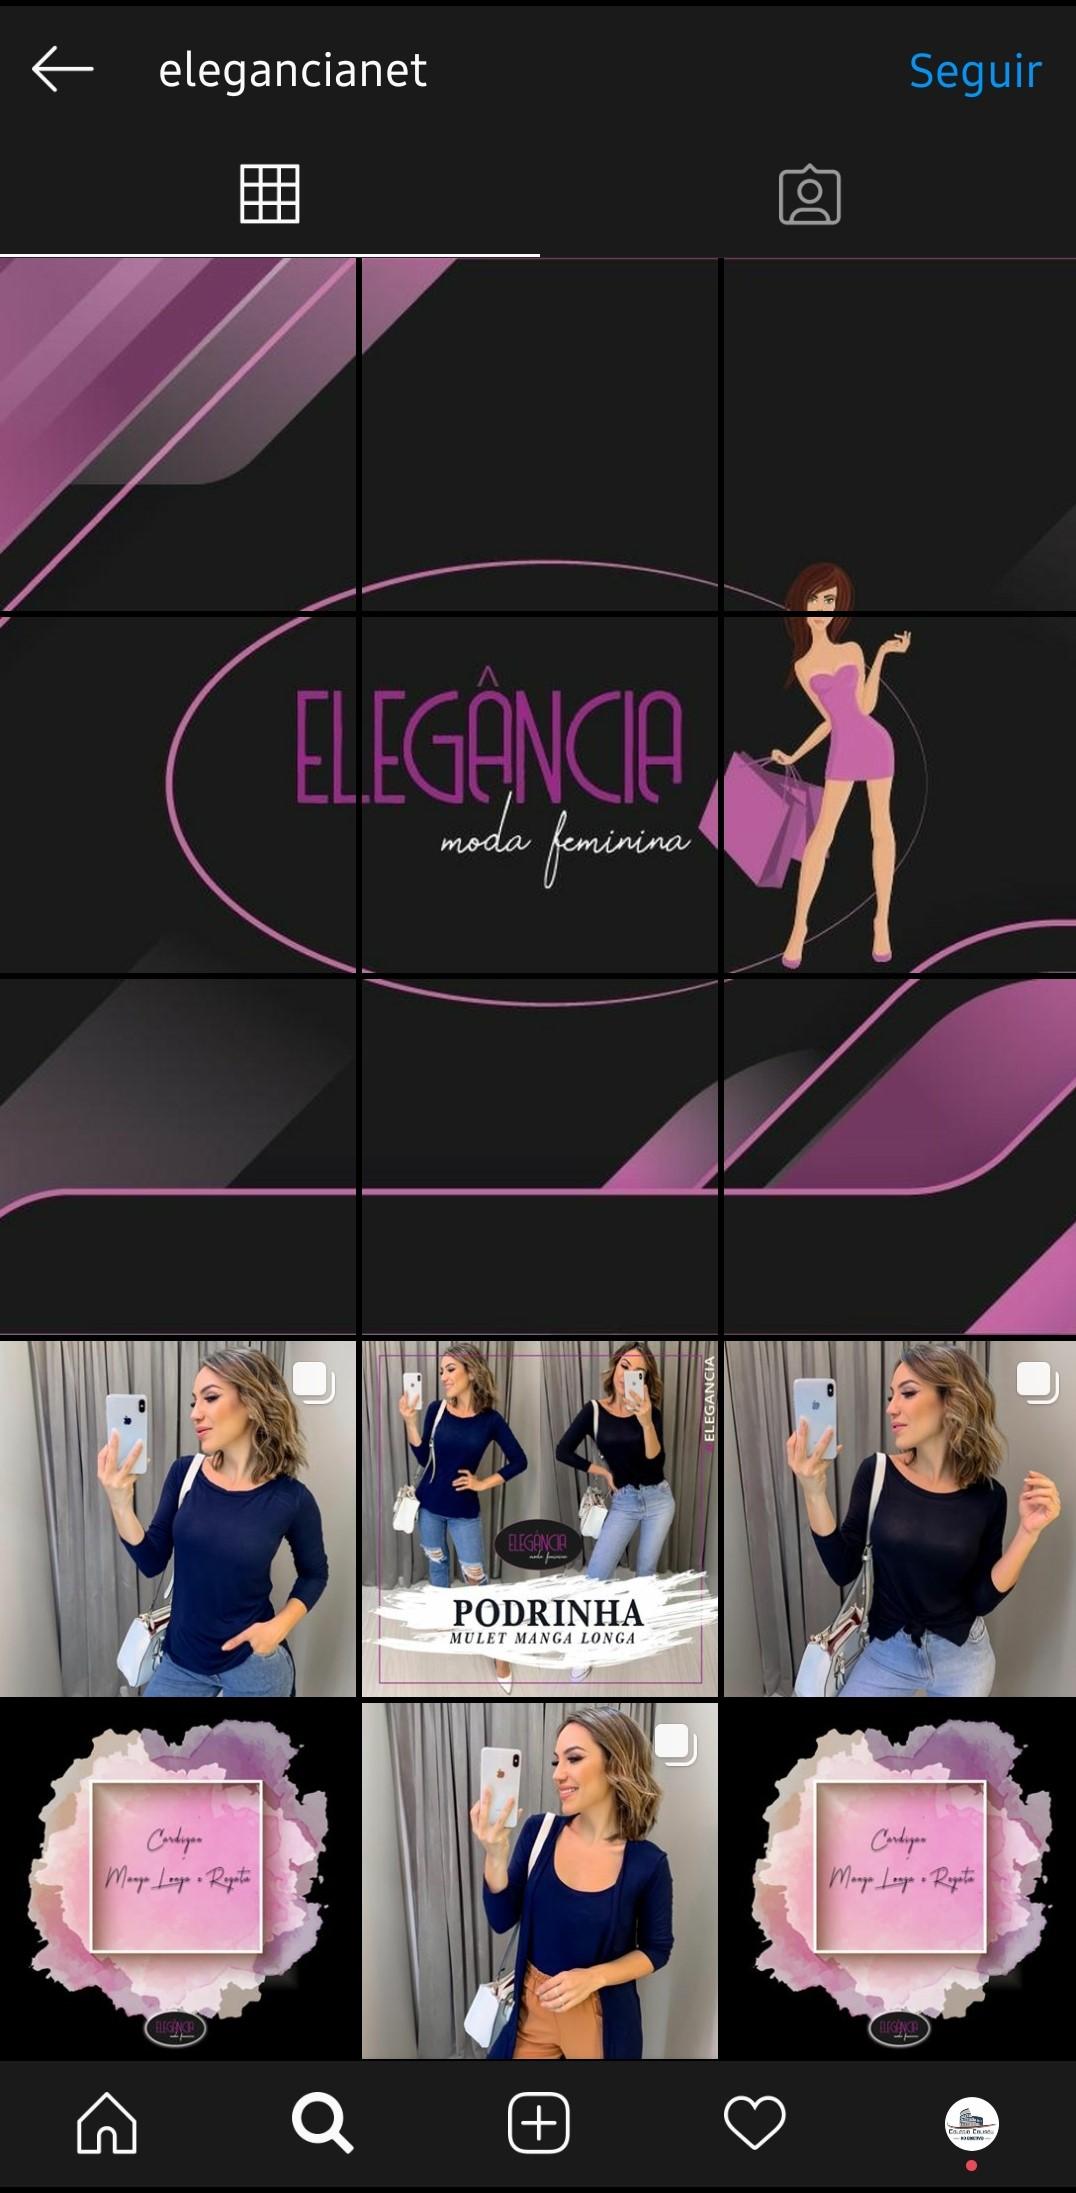 Elegancia Moda Feminina Instagram